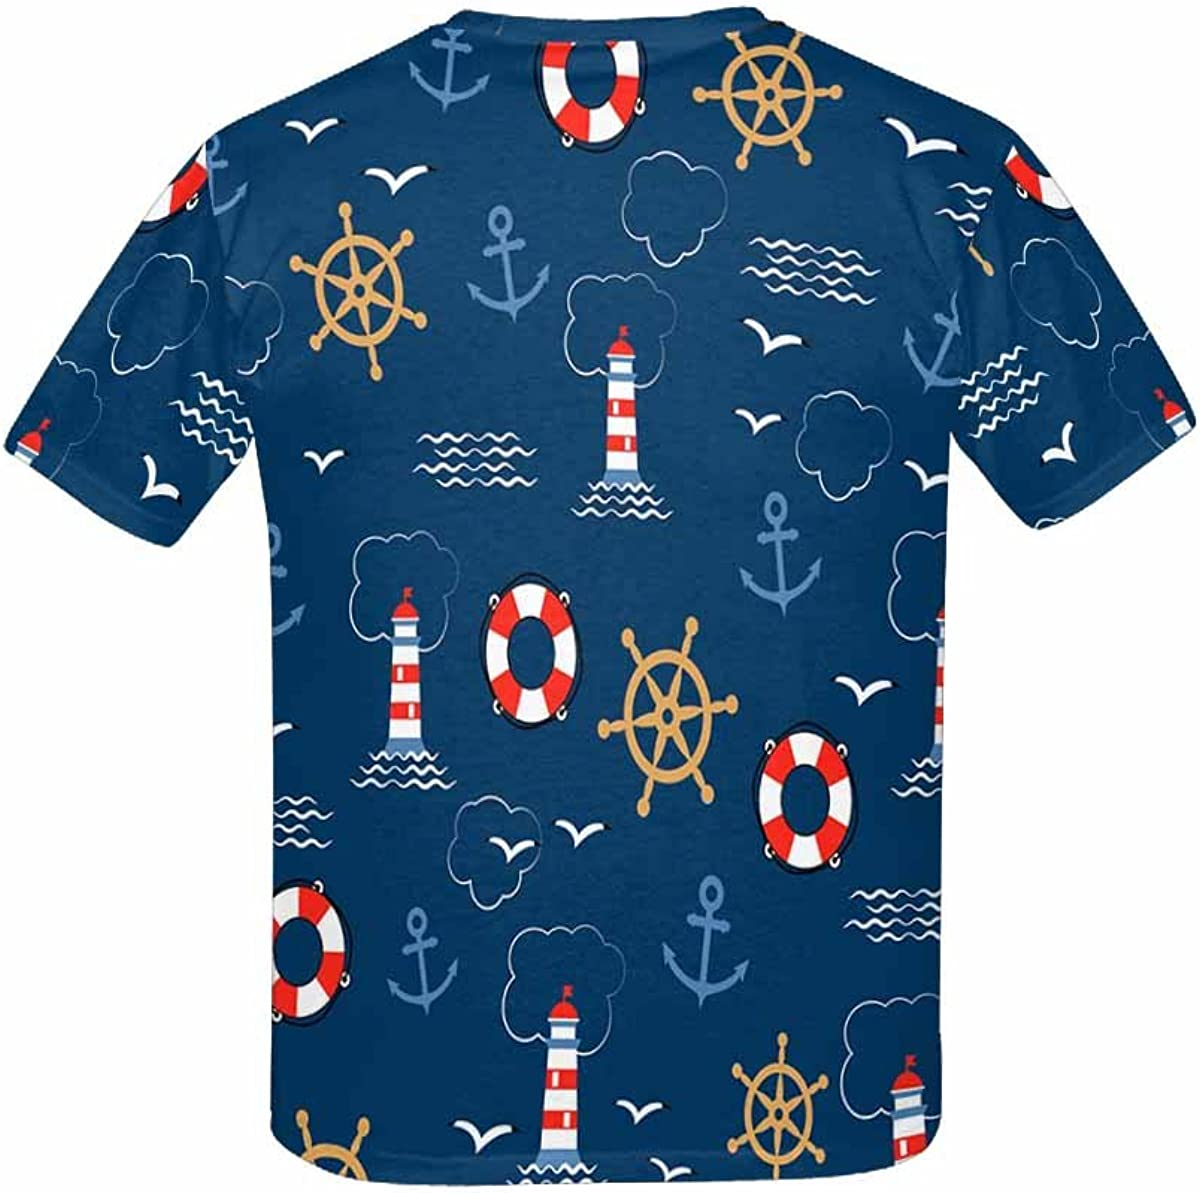 Helms Lifebuoys XS-XL INTERESTPRINT Kids T-Shirt Sea Anchors Seagulls